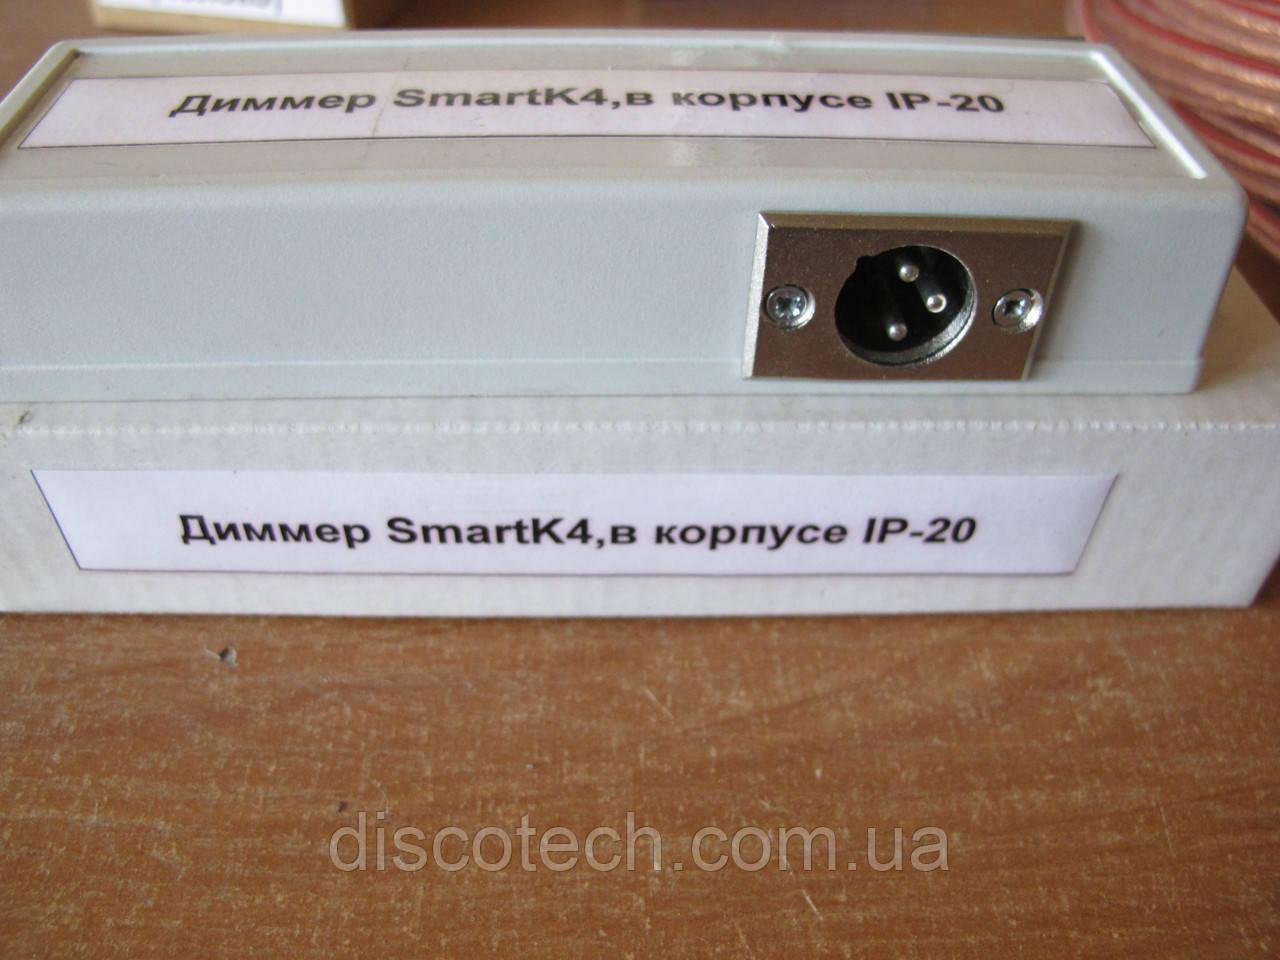 Диммер SmartK4, в корпусе IP-20